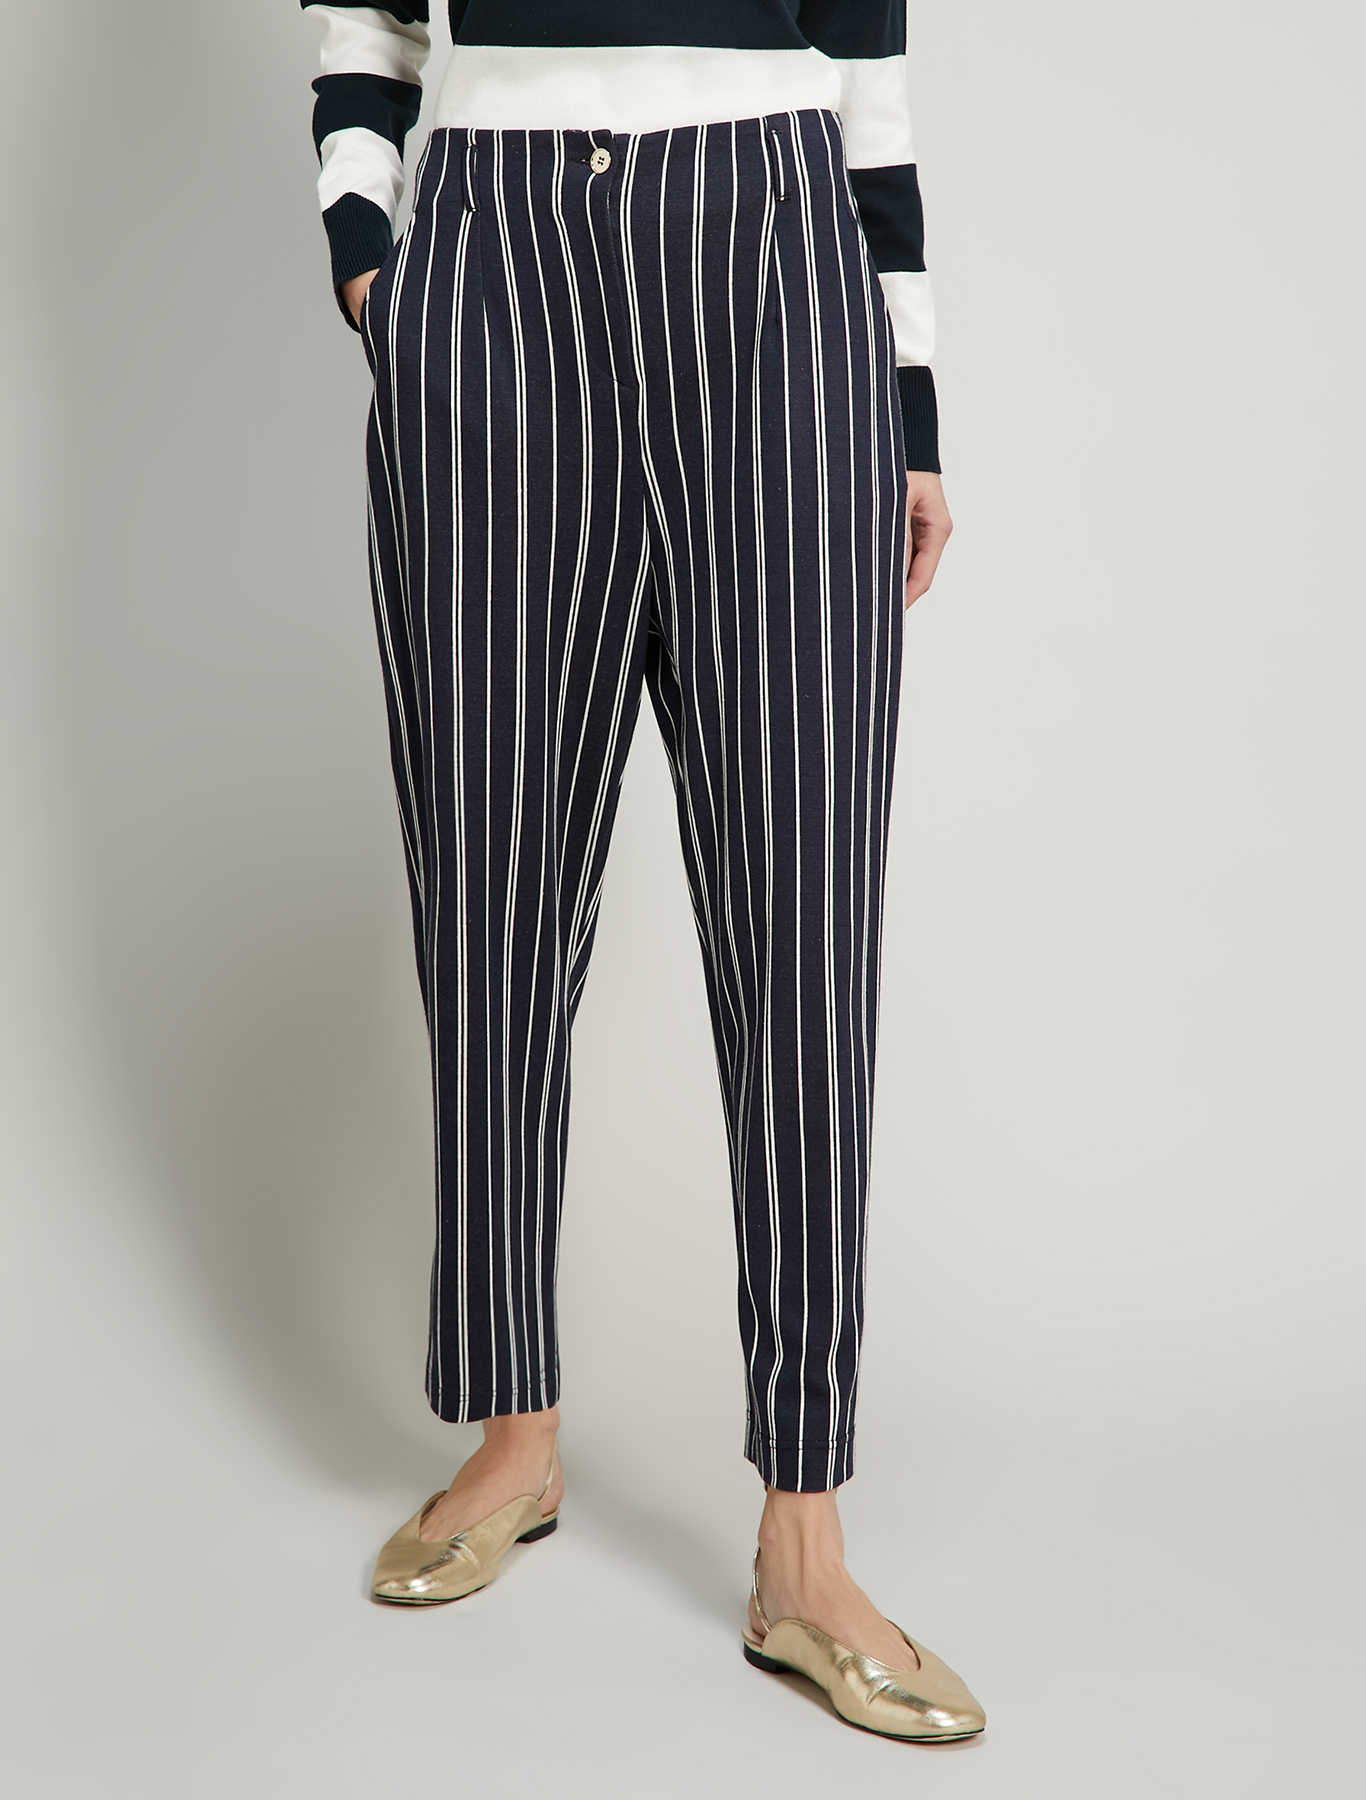 Jacquard jersey trousers - navy blue pattern - pennyblack